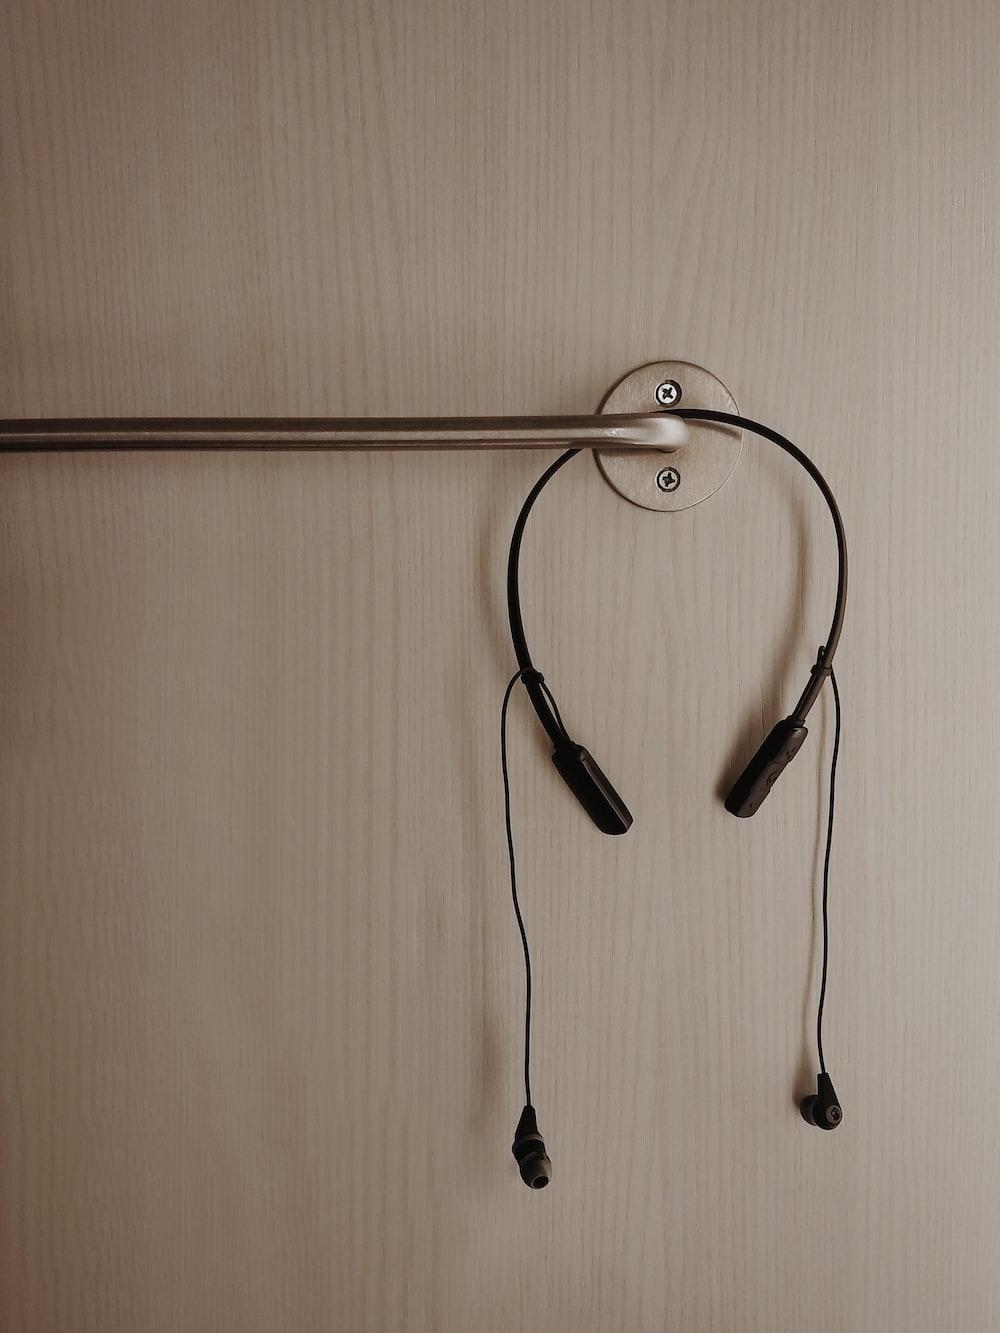 black Bluetooth headset